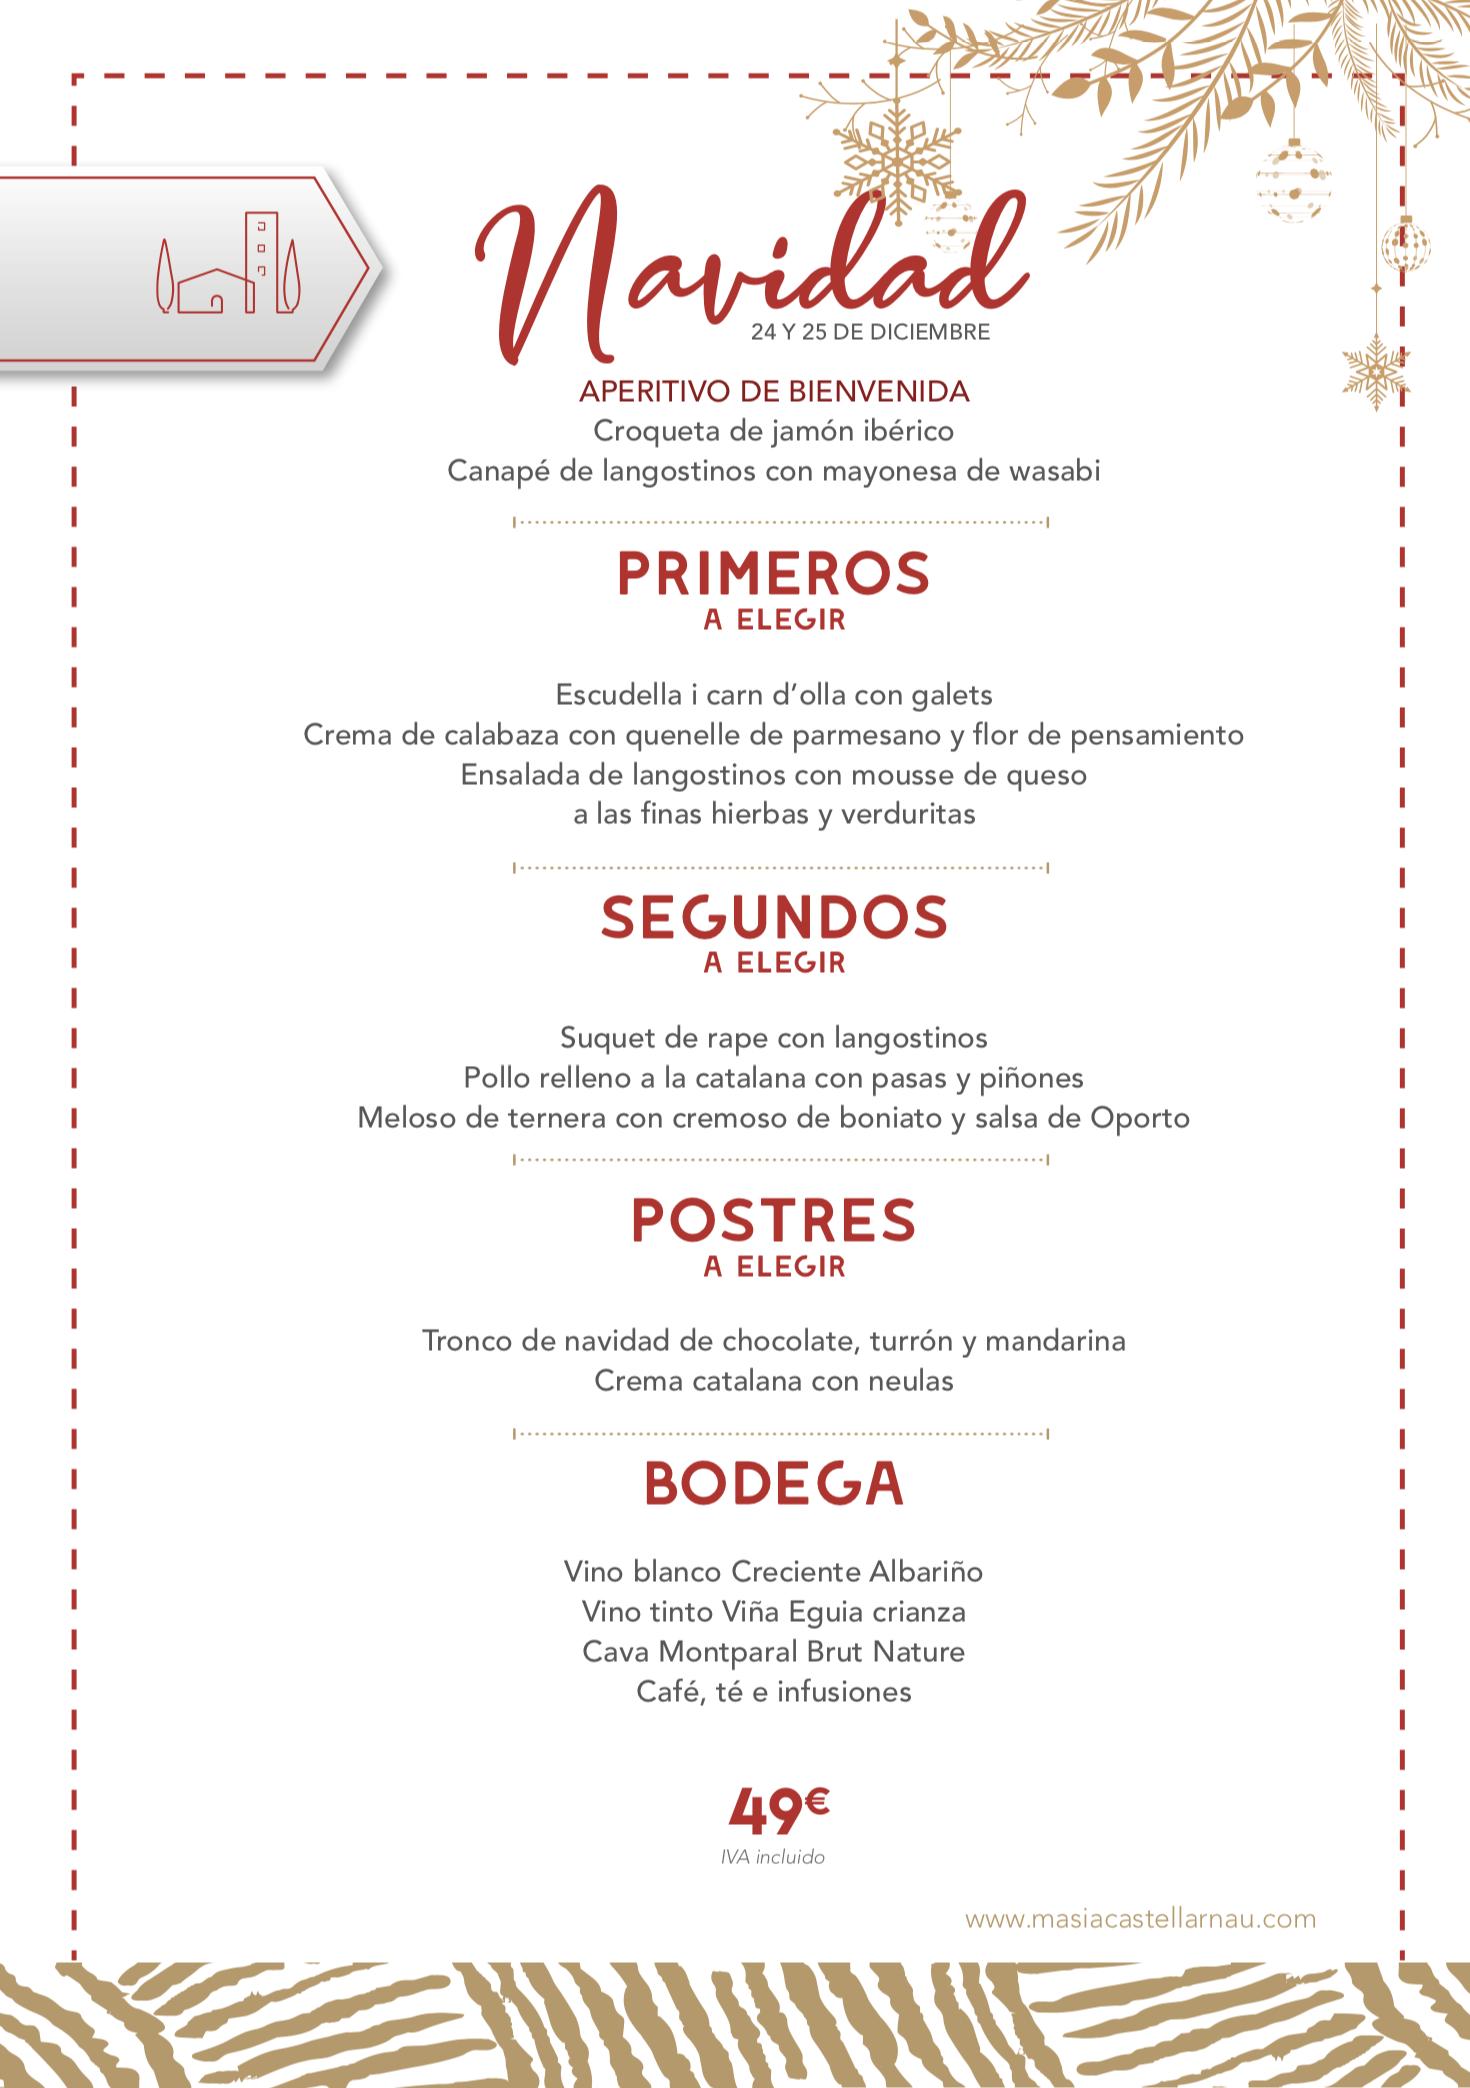 Menú Navidad Masia castellarnau